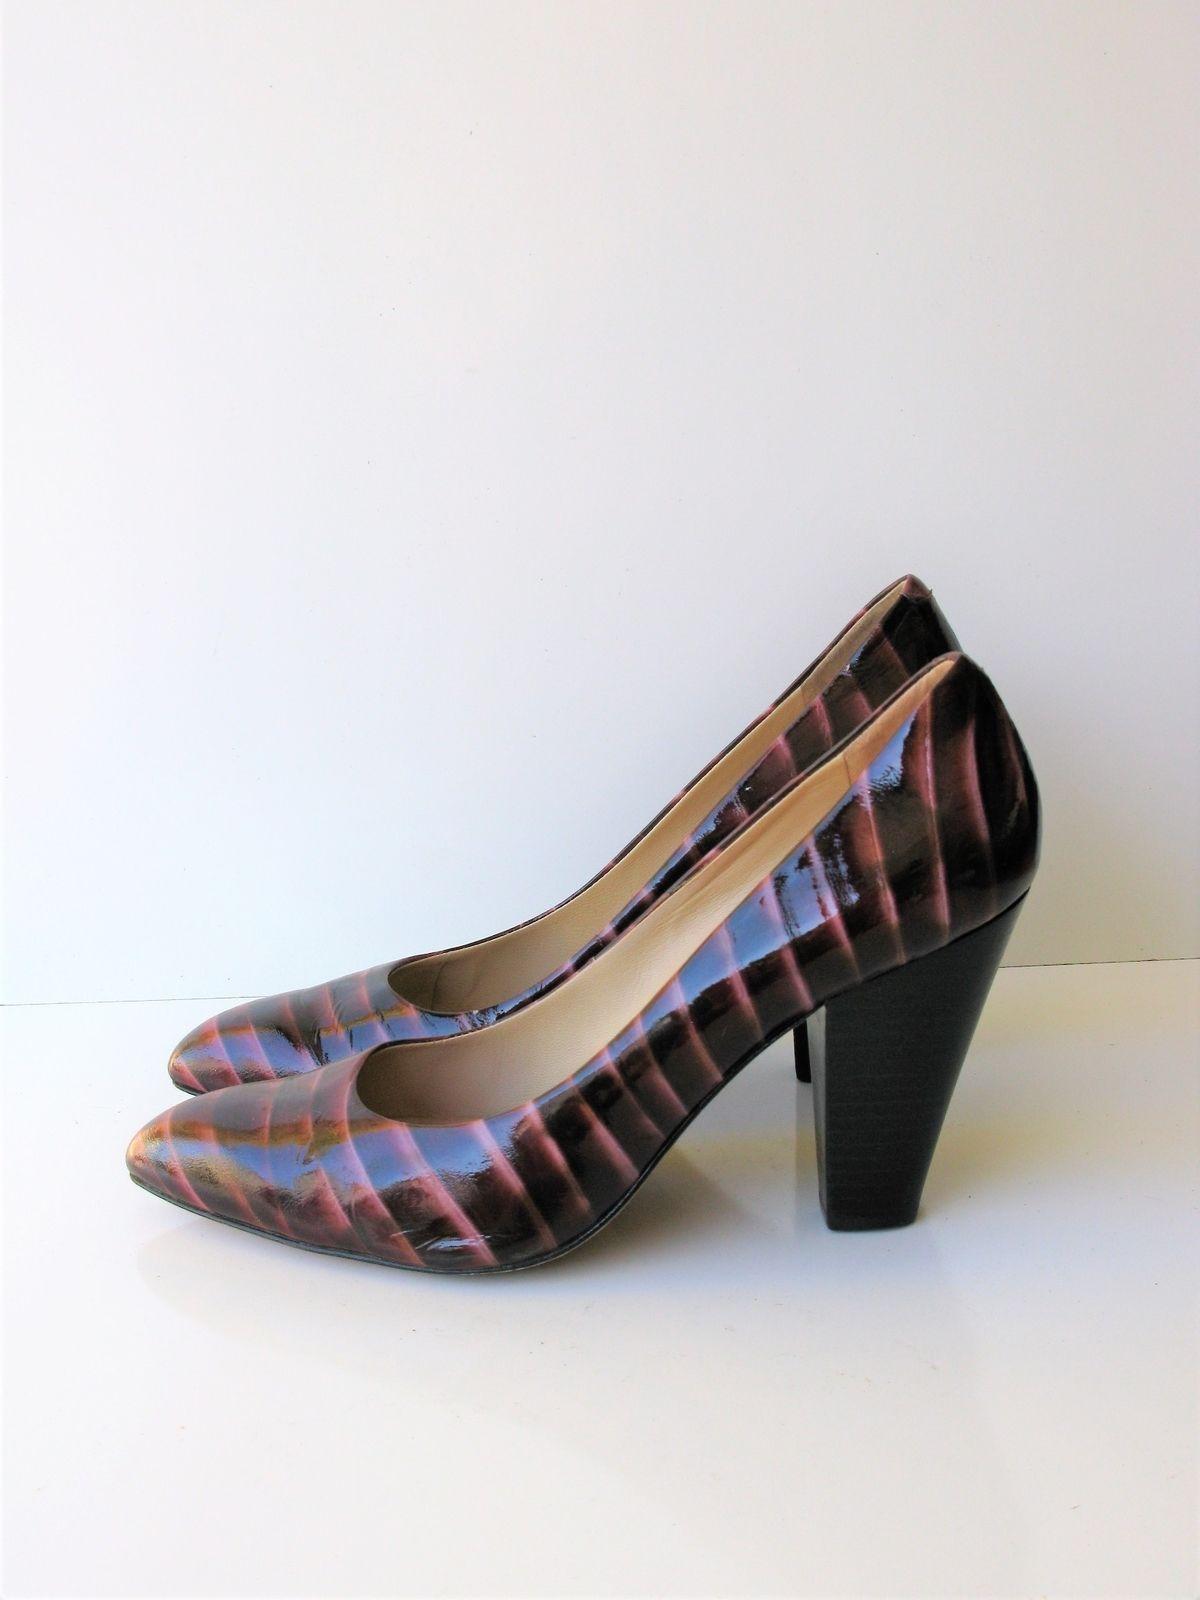 Pumps Heels Joan & David Patent Leather Reptile Print Burgundy 9.5 $225 MSRP